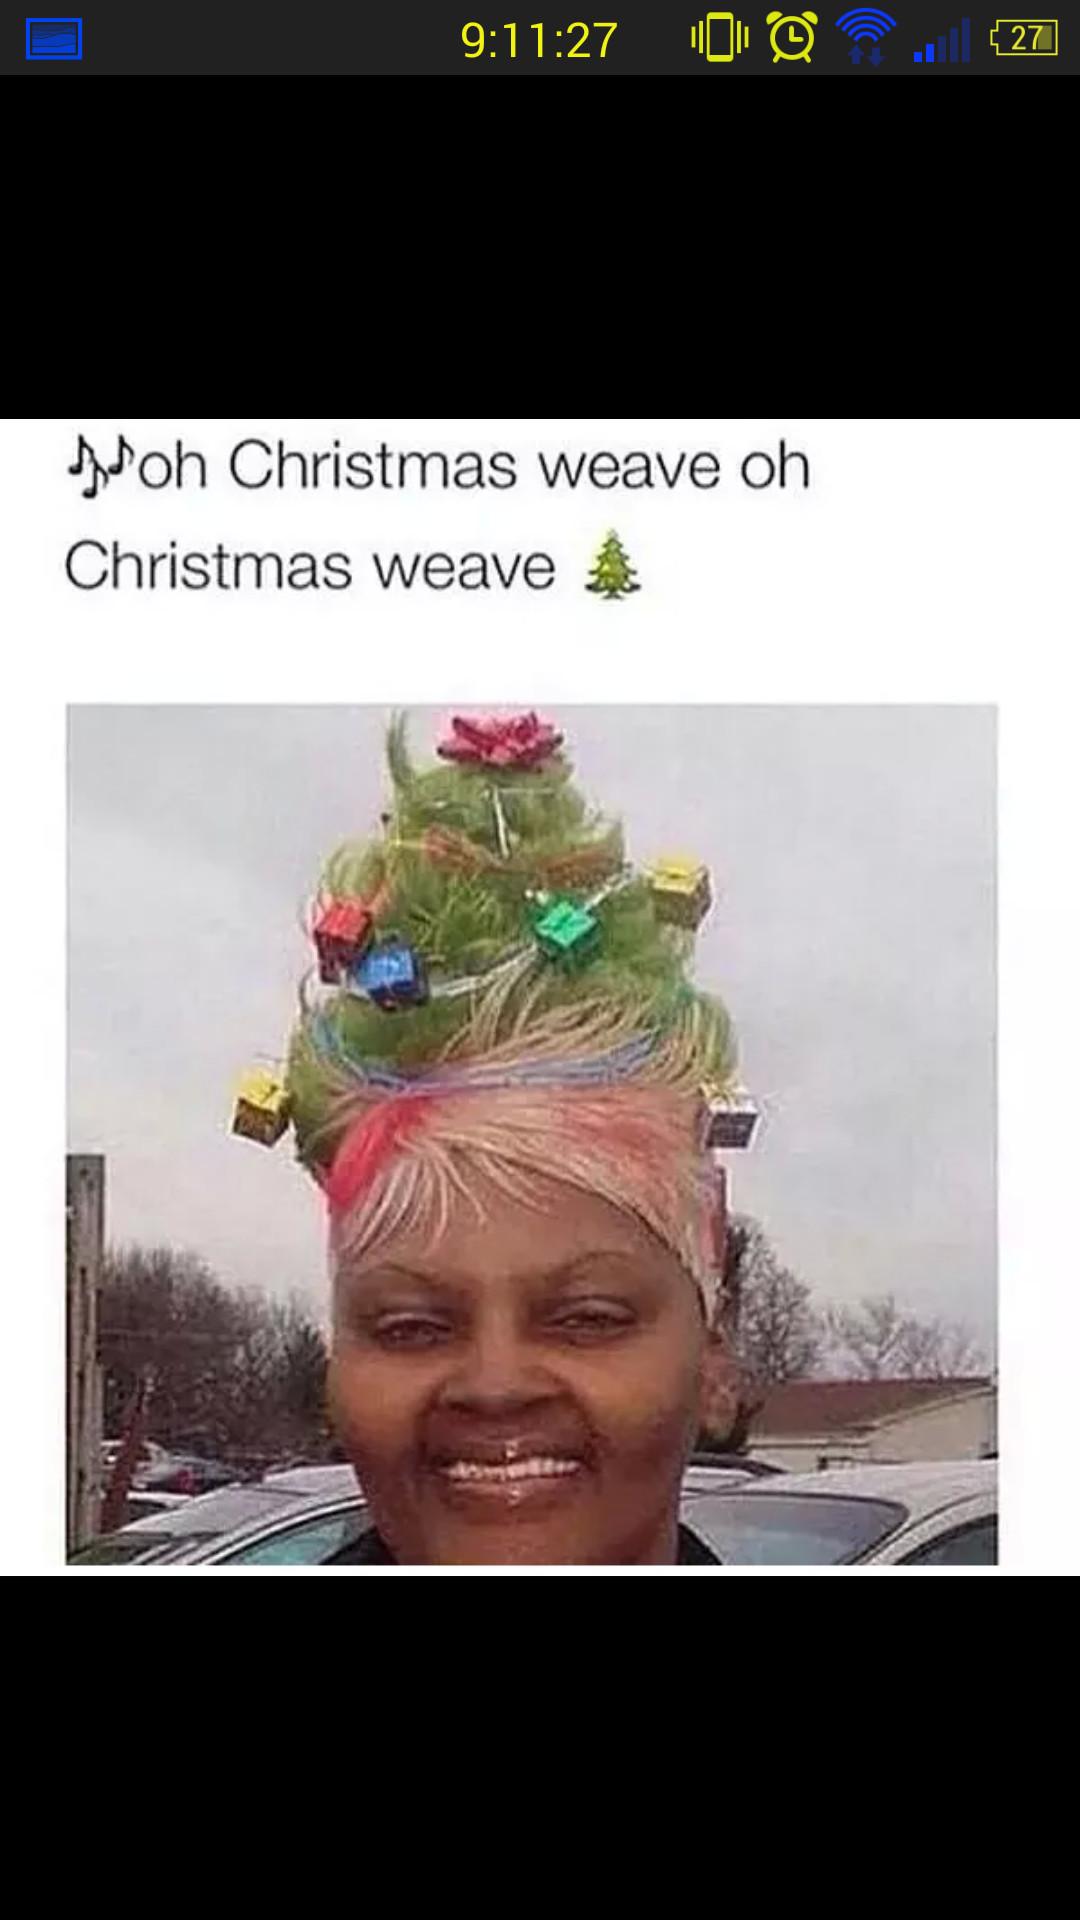 Wonder where she puts the mistletoe? - Meme by hunke :) Memedroid